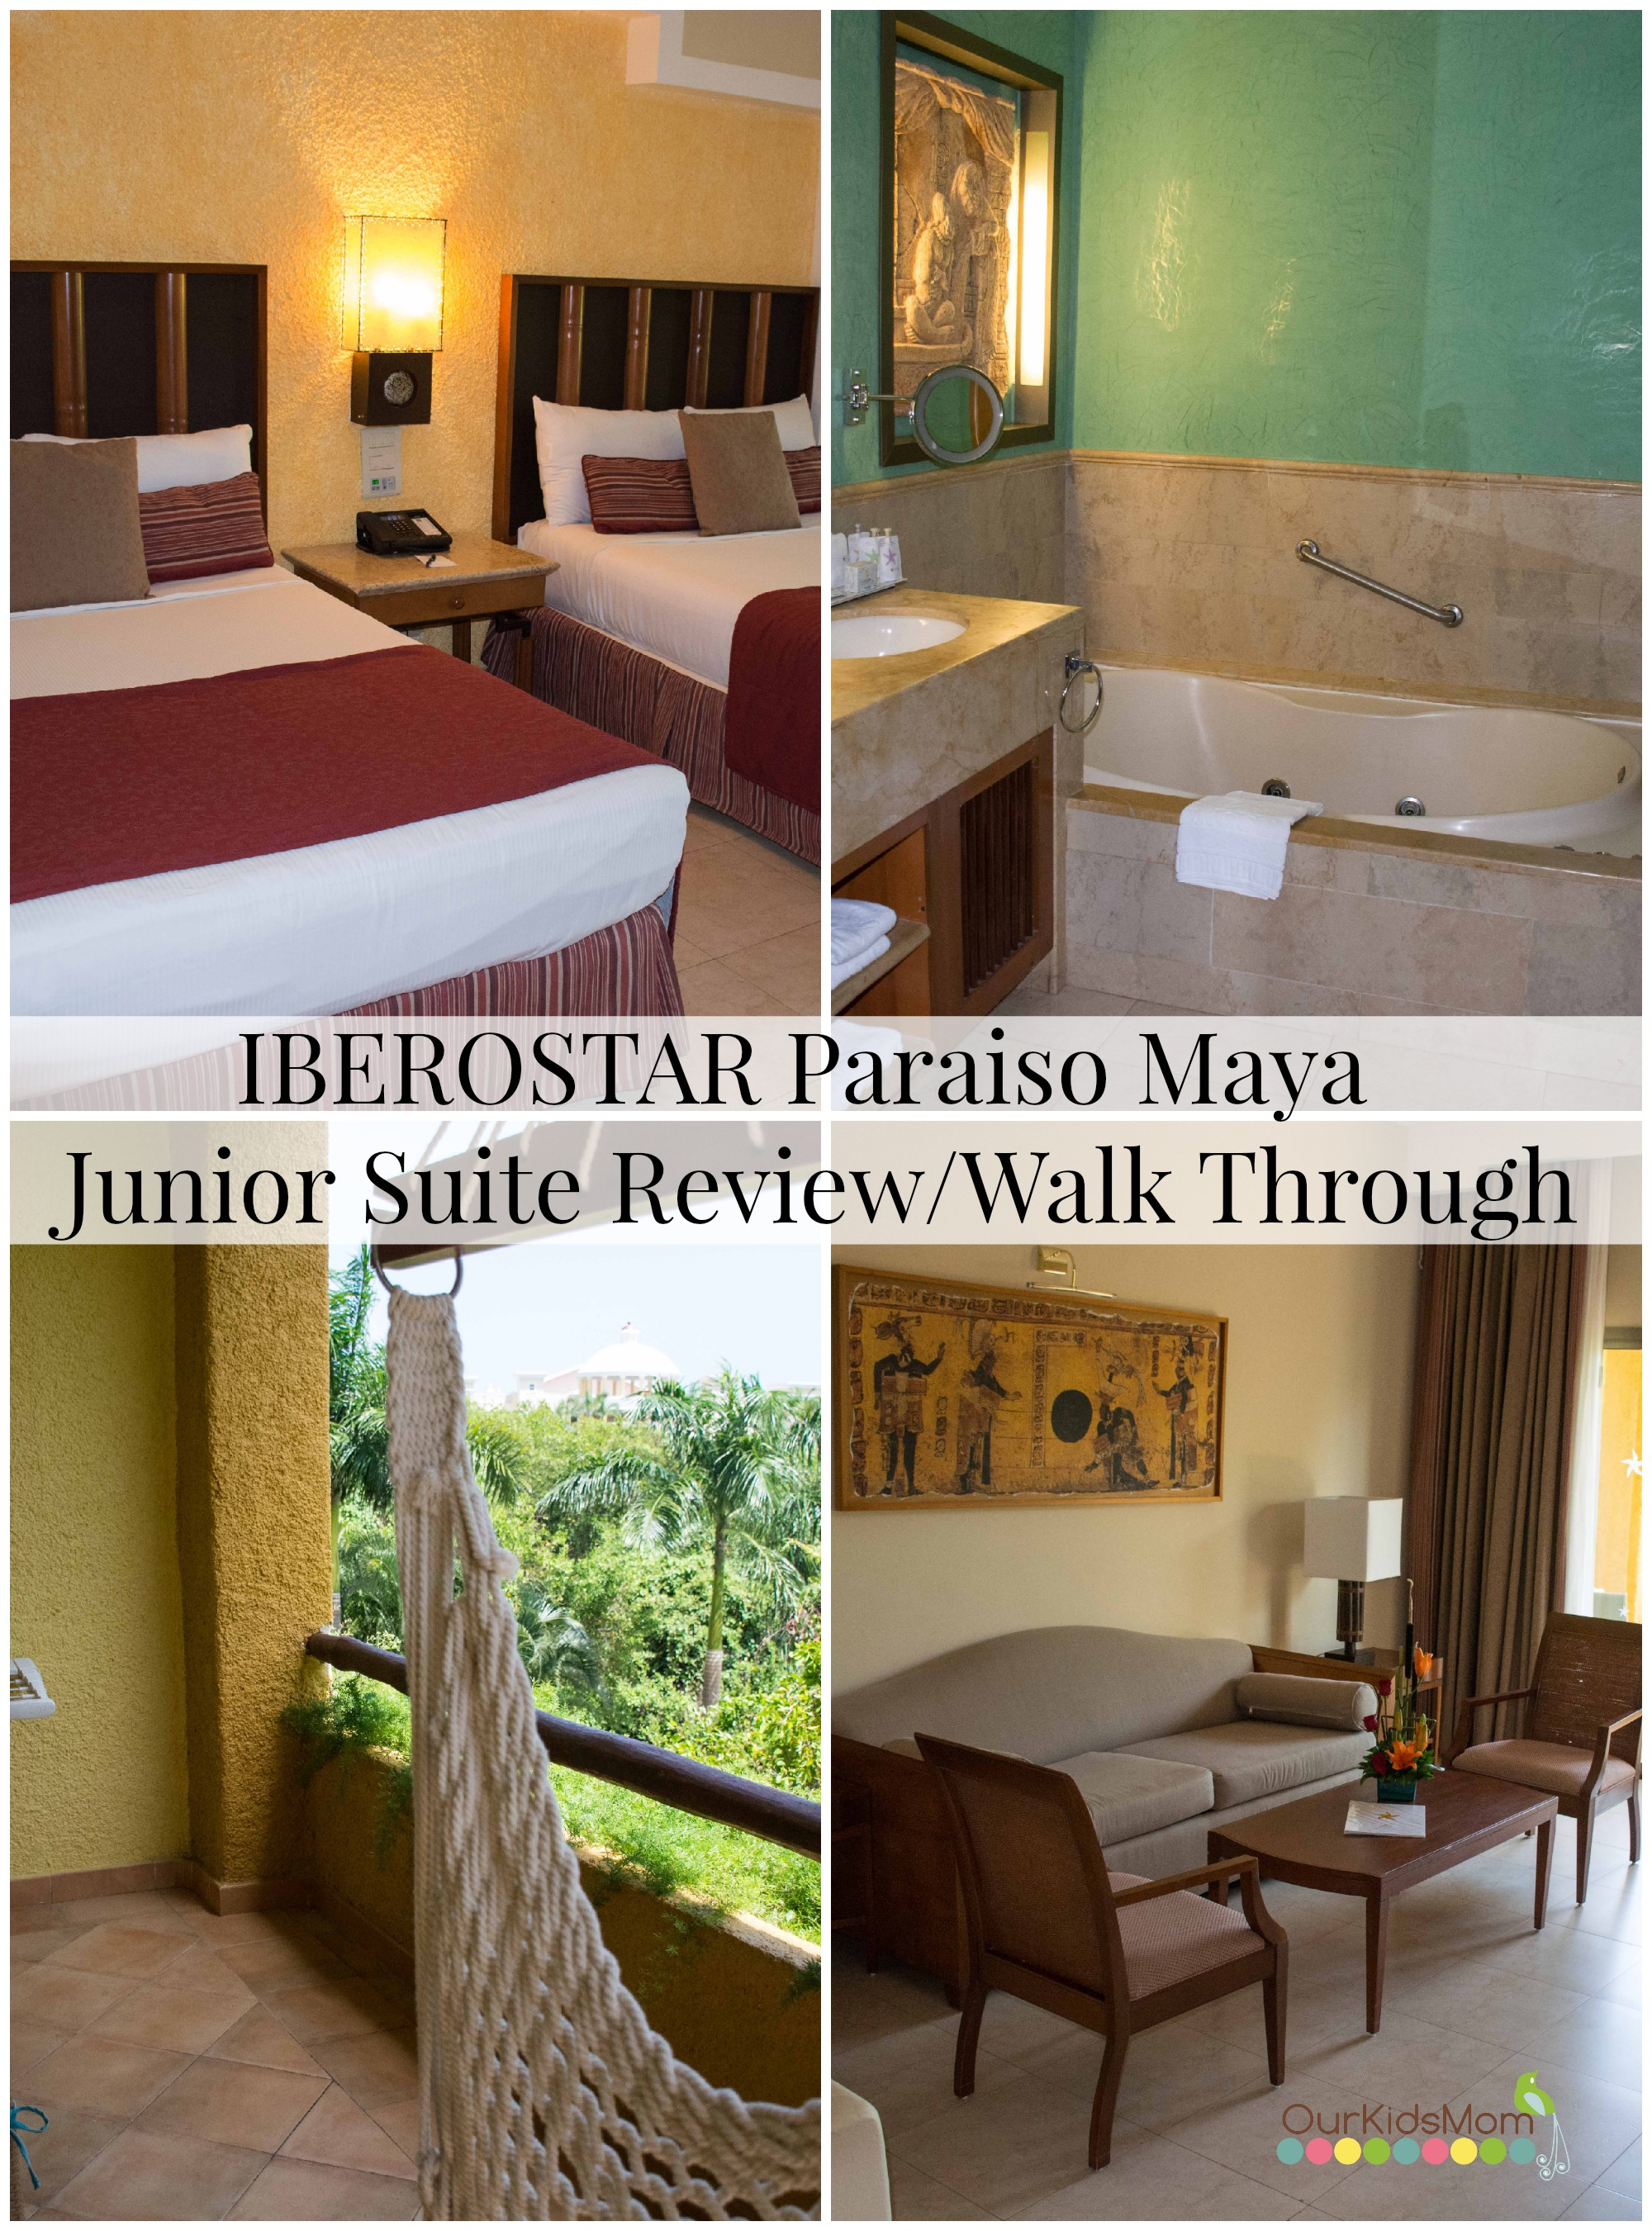 IBEROSTAR Paraiso Maya in Riviera Maya Mexico Review & Walk Through Video